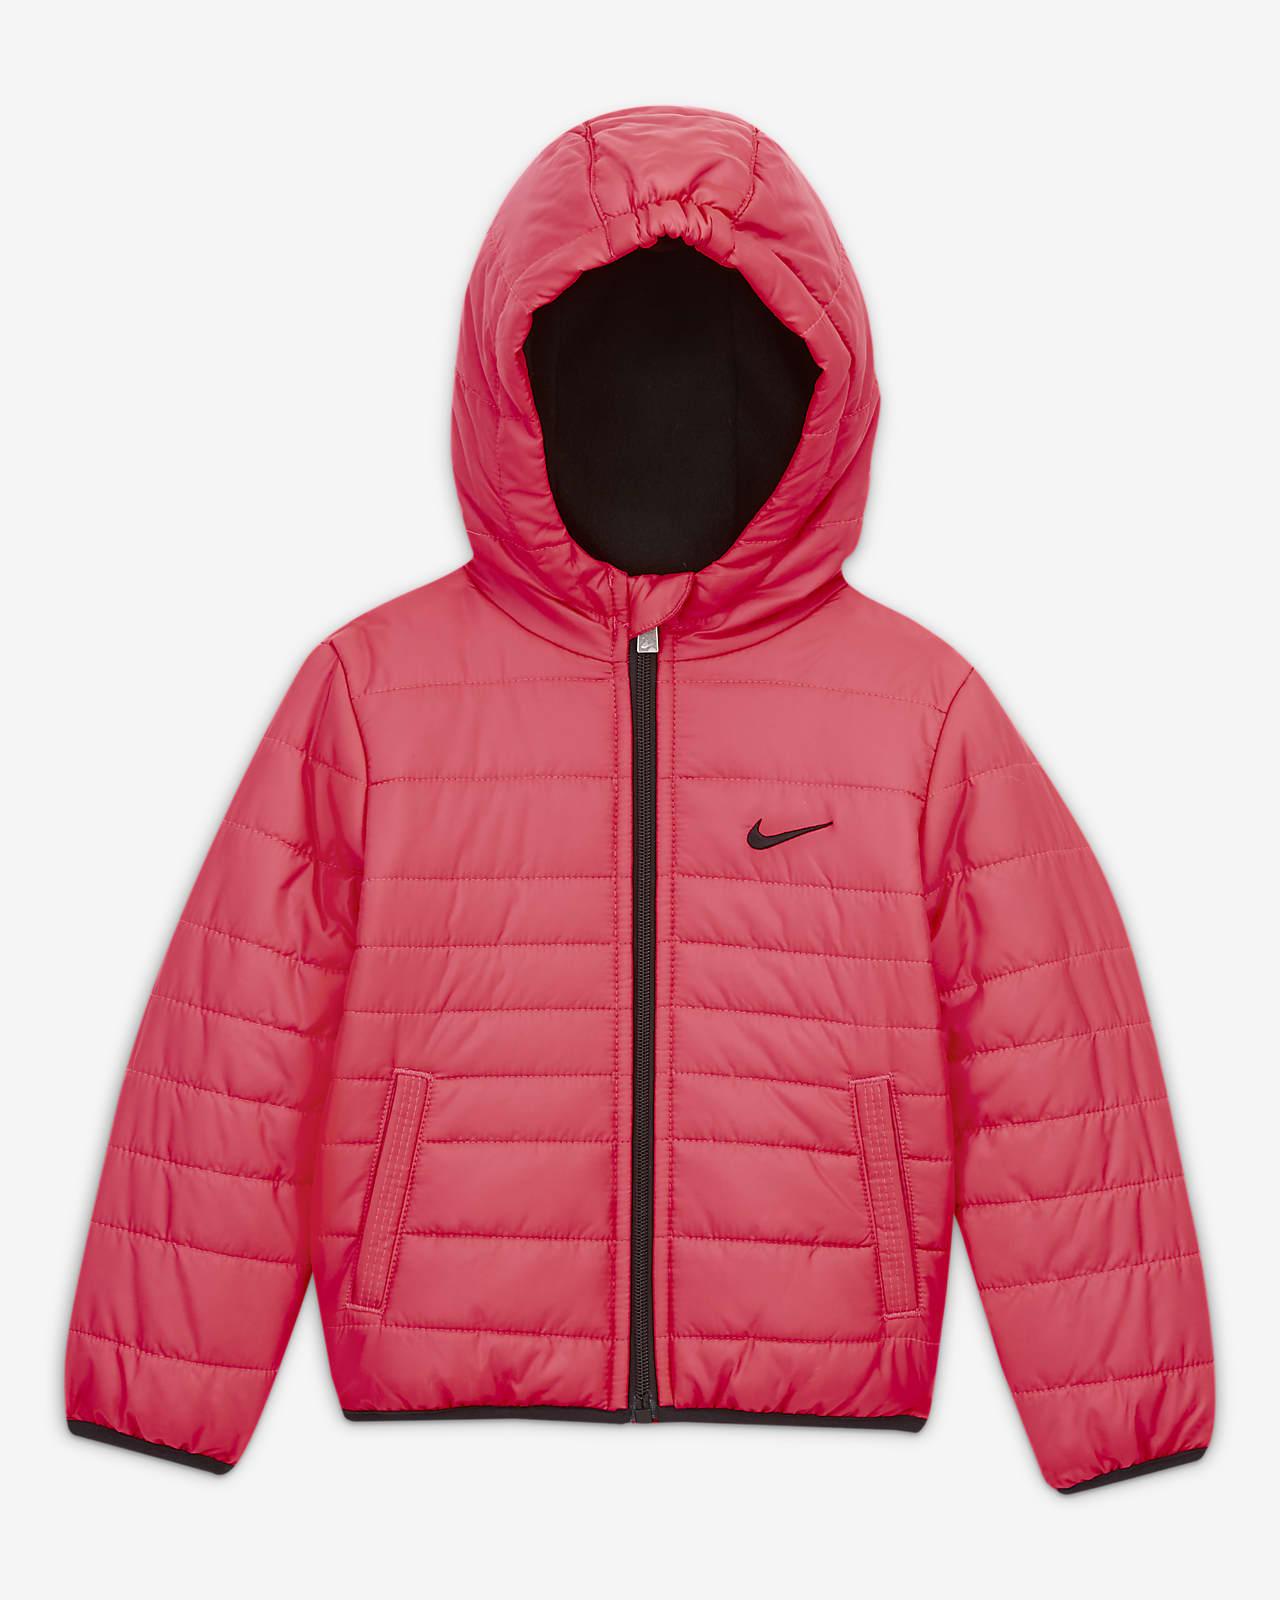 Giacca piumino Nike - Neonati (12-24 mesi)